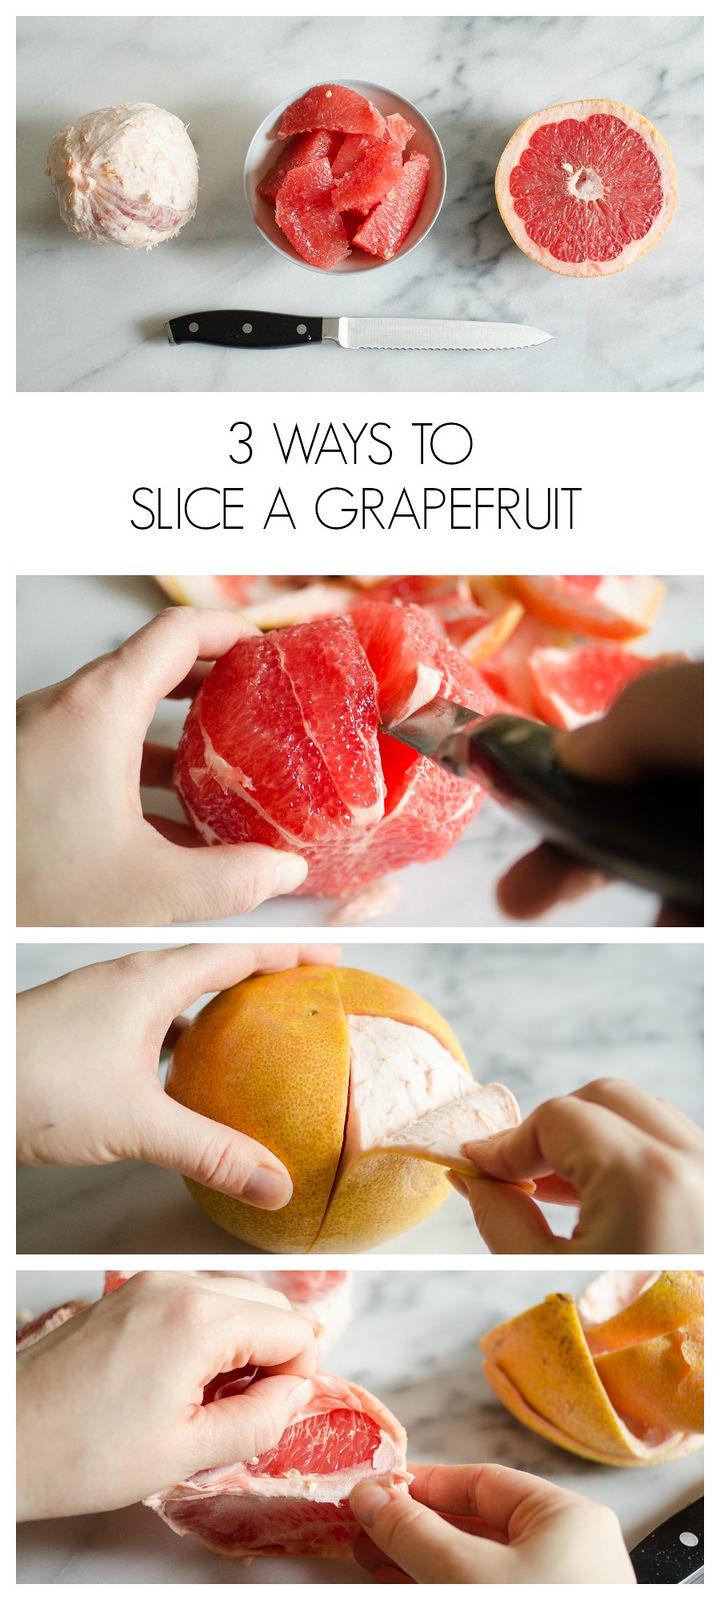 3 Ways to Slice a Grapefruit